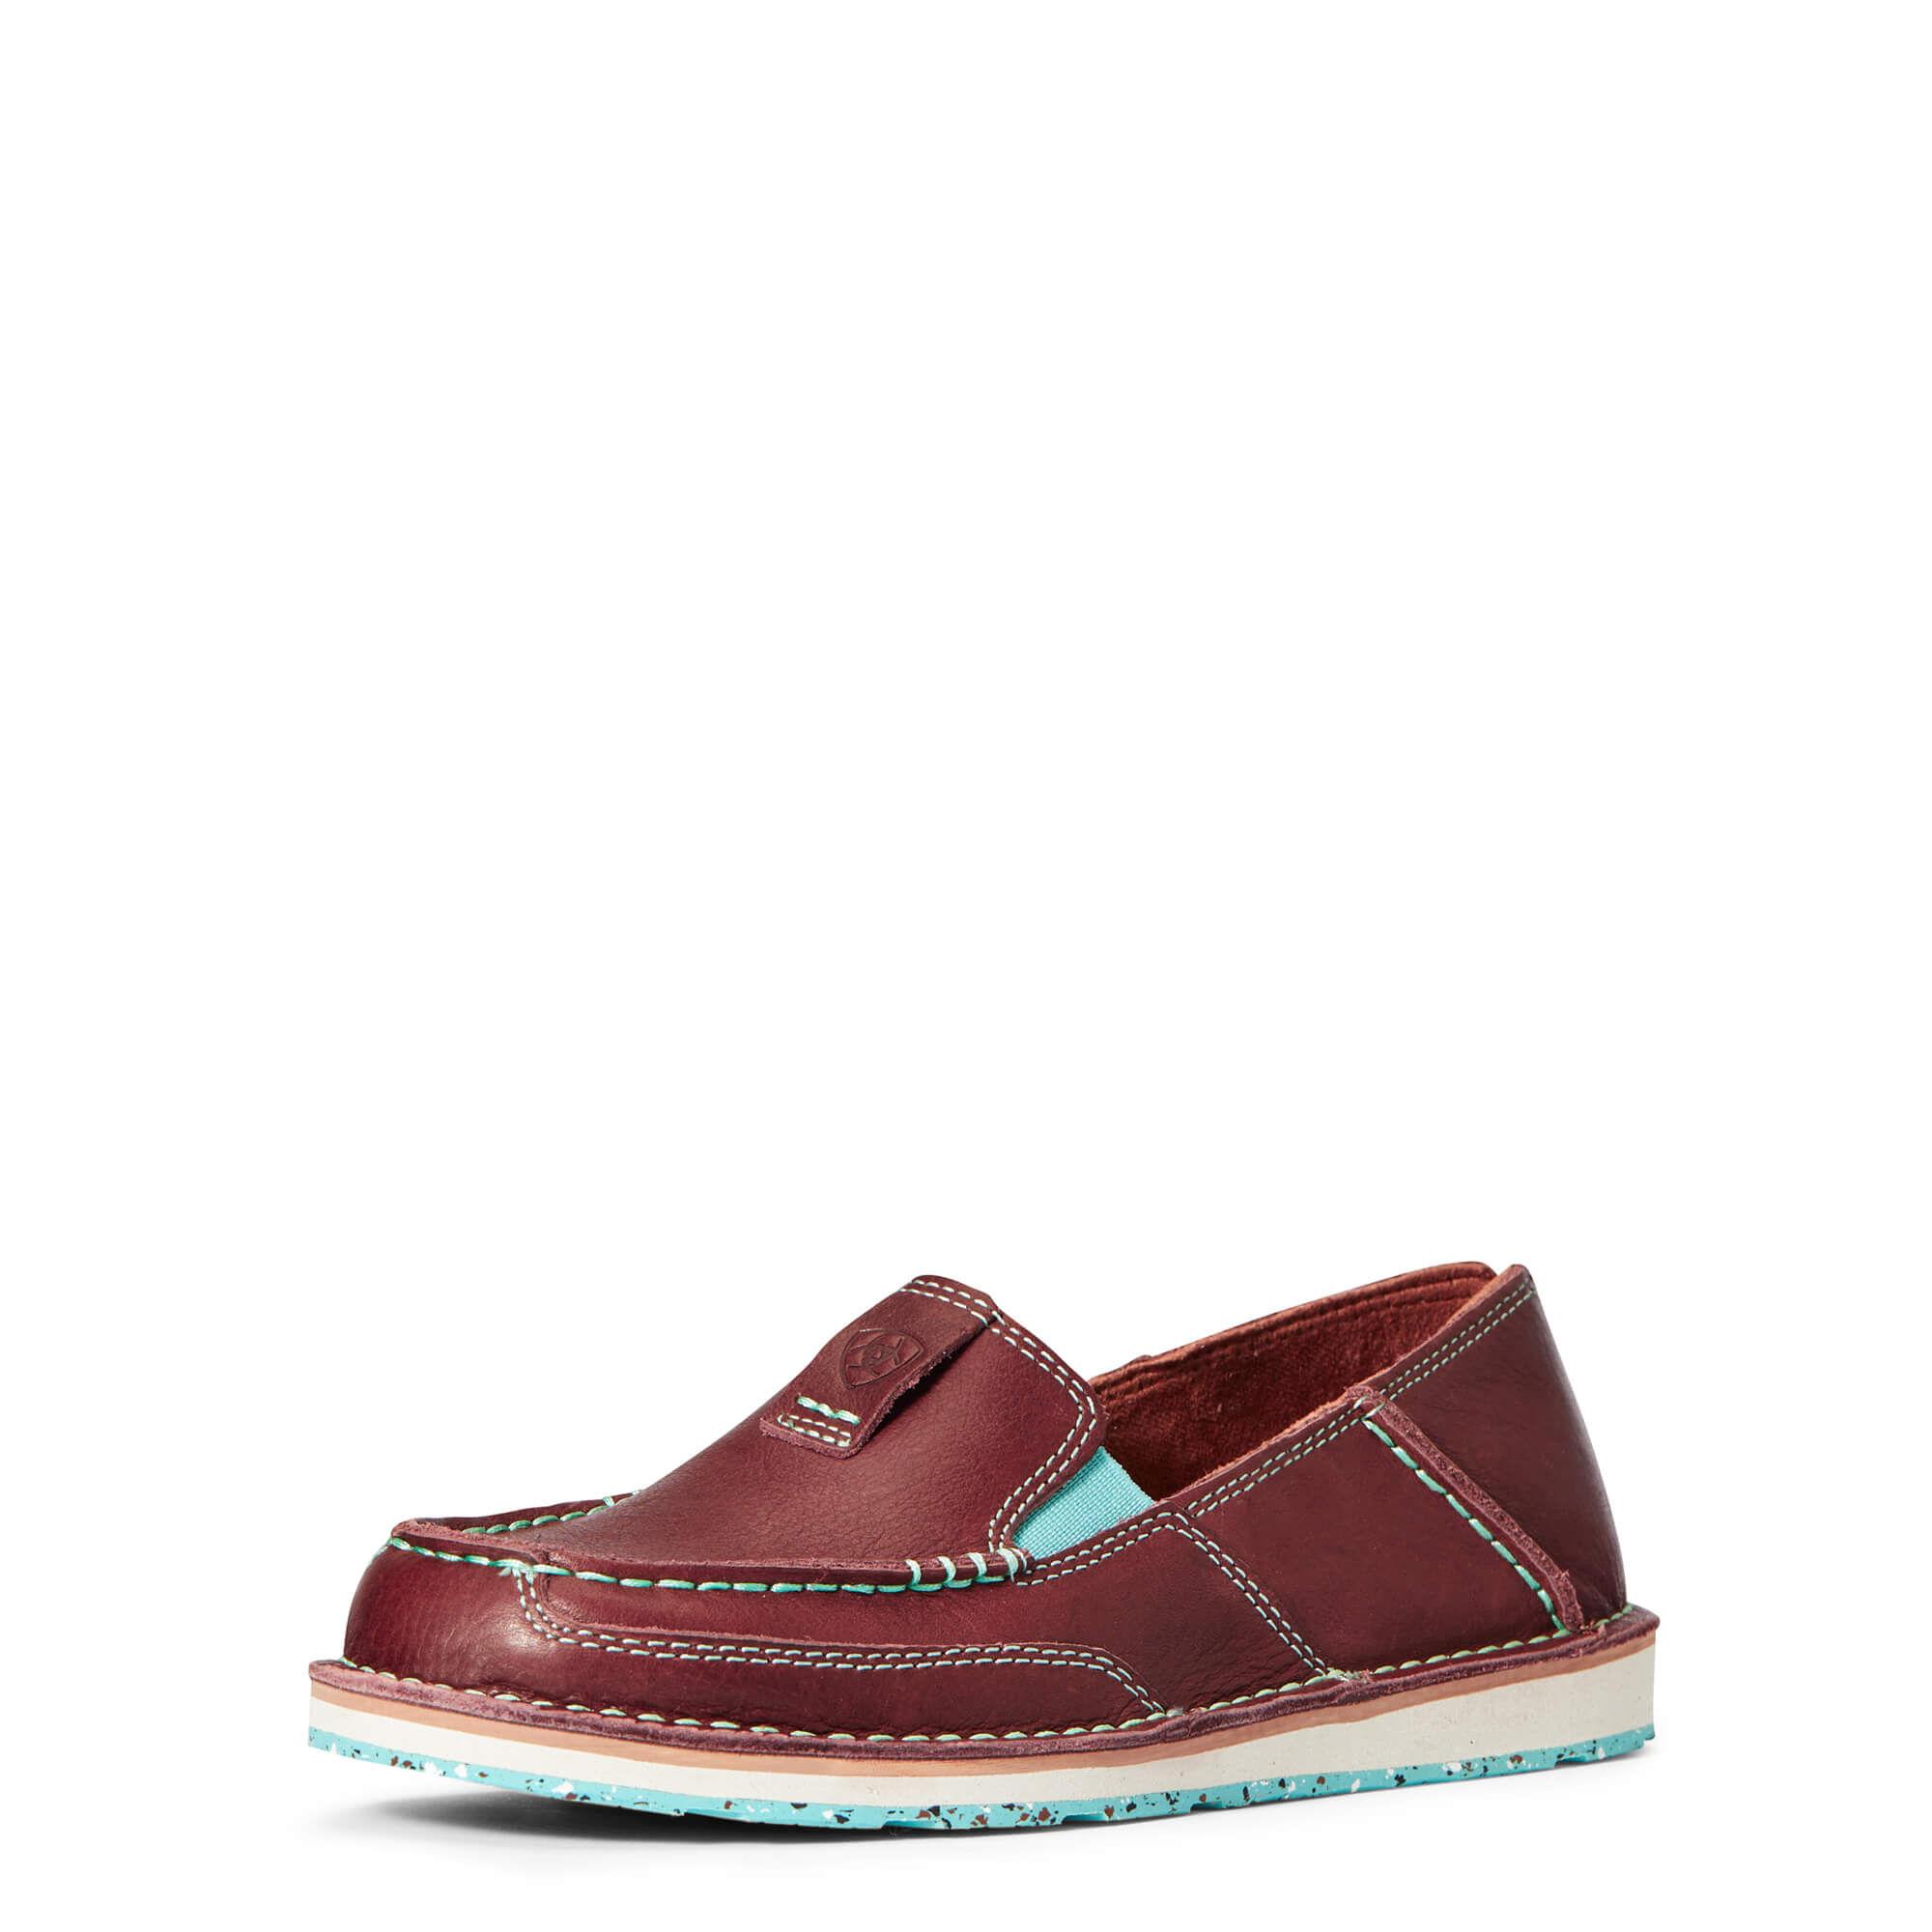 Ariat Womens Shoes - Women's Casual